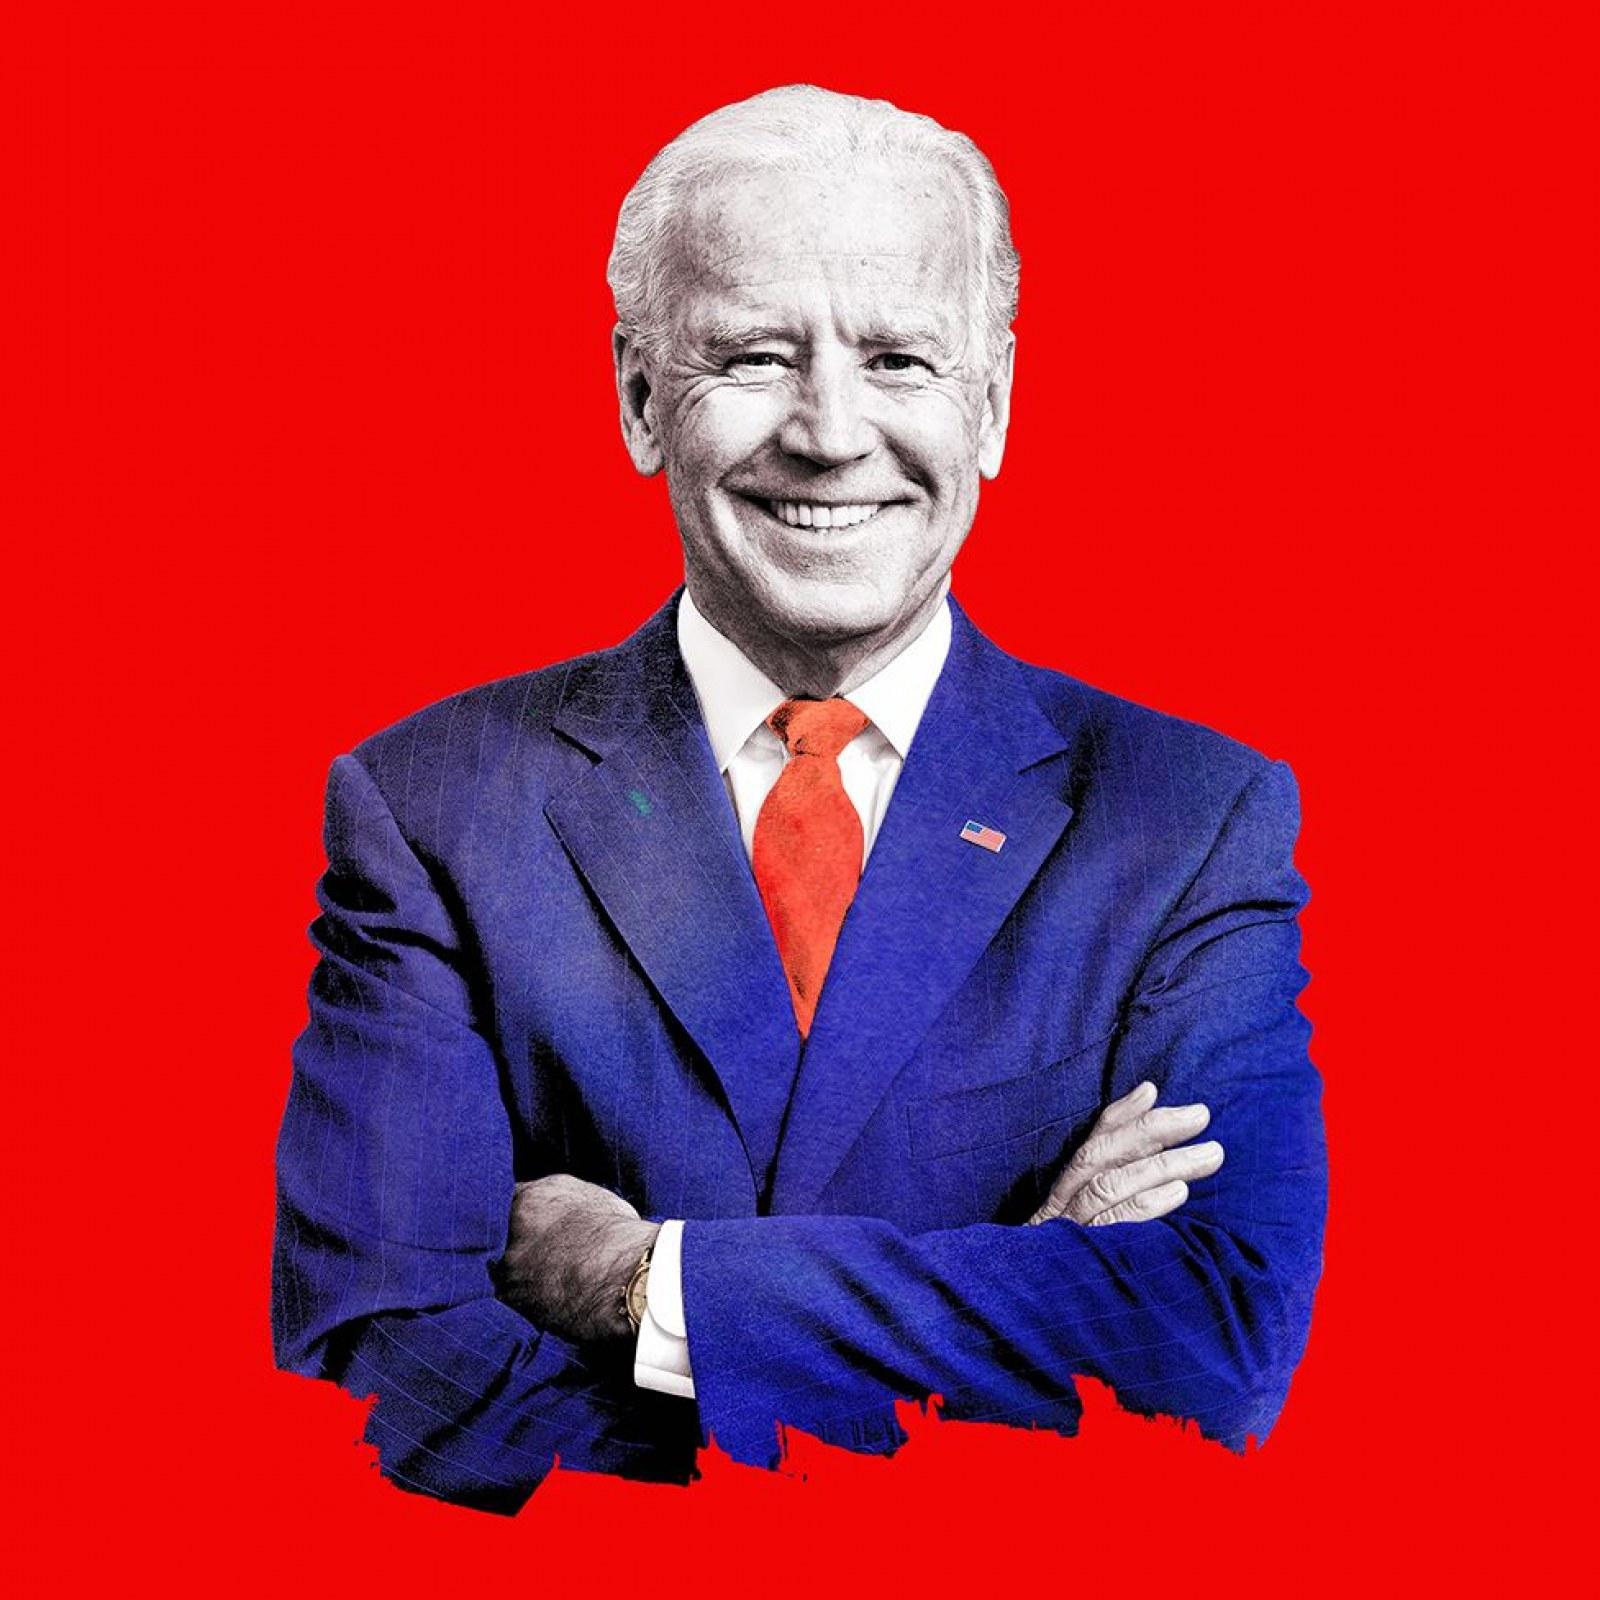 1ceedf5d8 Joe Biden Can Beat Trump in 2020, but Will the Democratic Party Let Him Run?